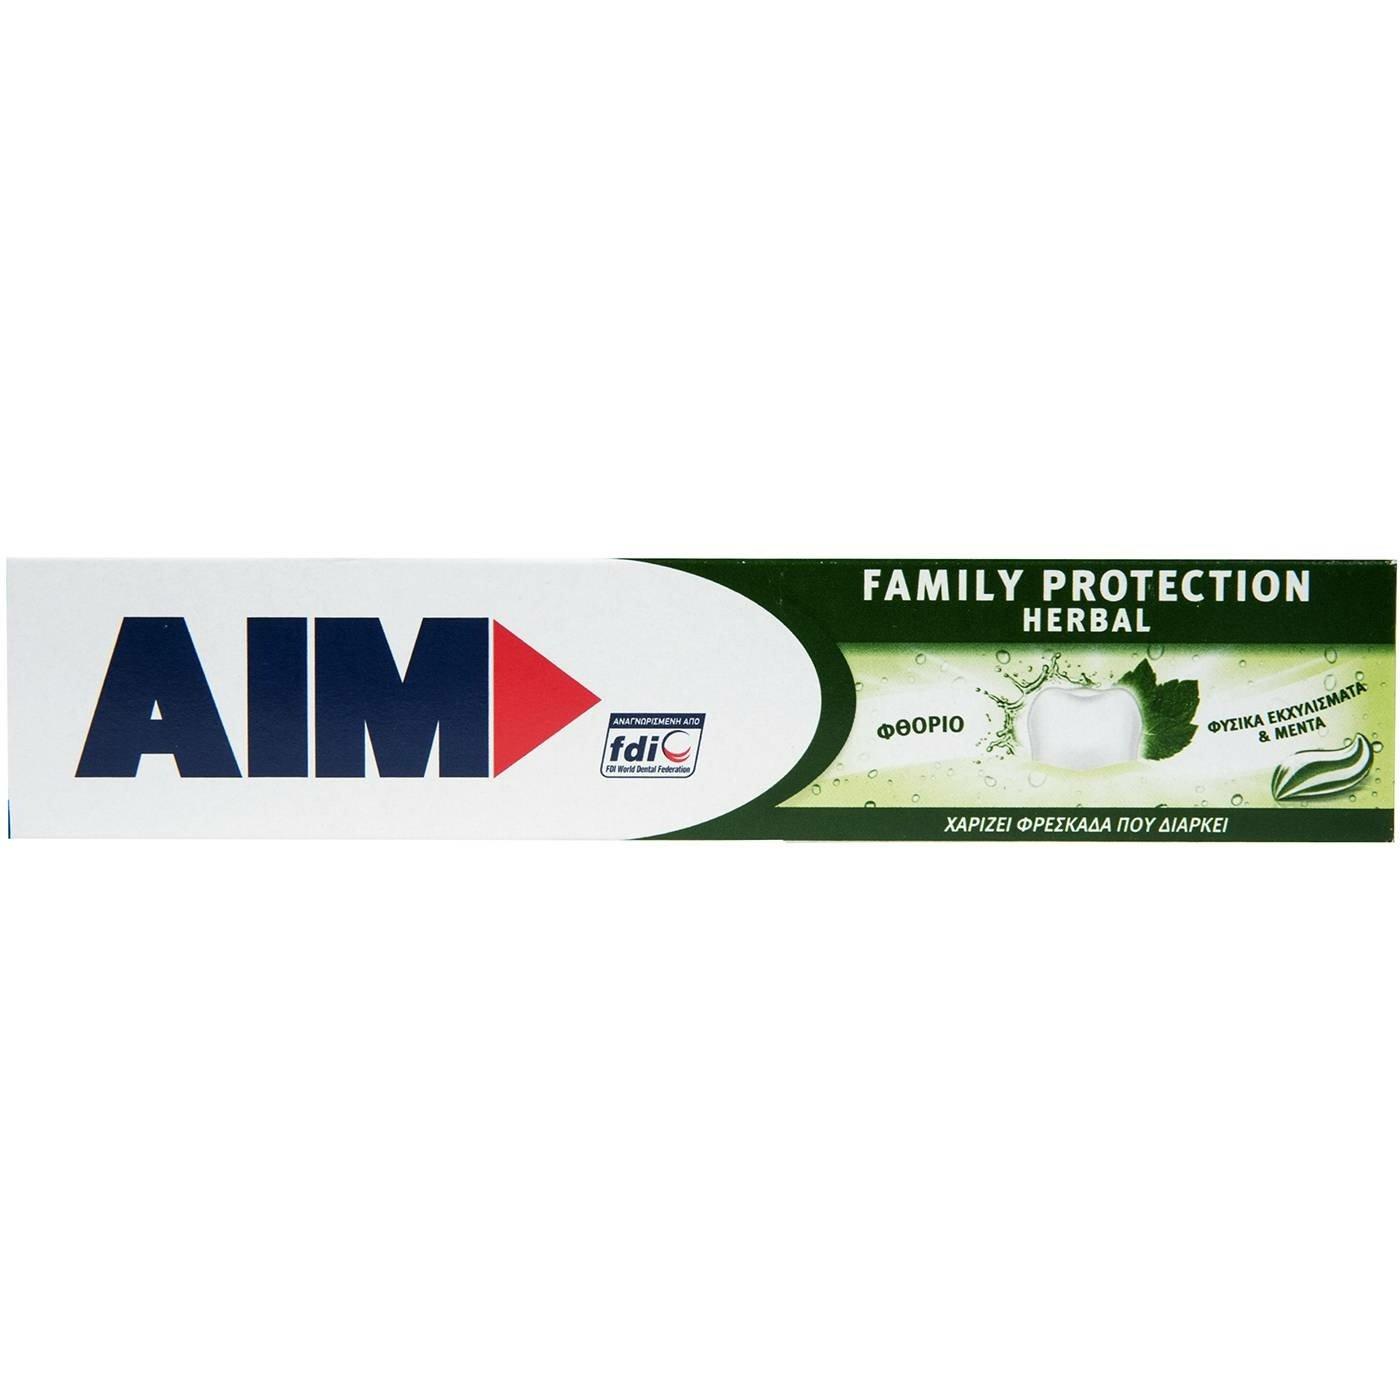 Aim Family Protection Herbal Οδοντόκρεμα με Φυσικά Εκχυλίσματα για Καταπολέμηση της Κακοσμίας & για Φρεσκάδα που Διαρκεί 75ml